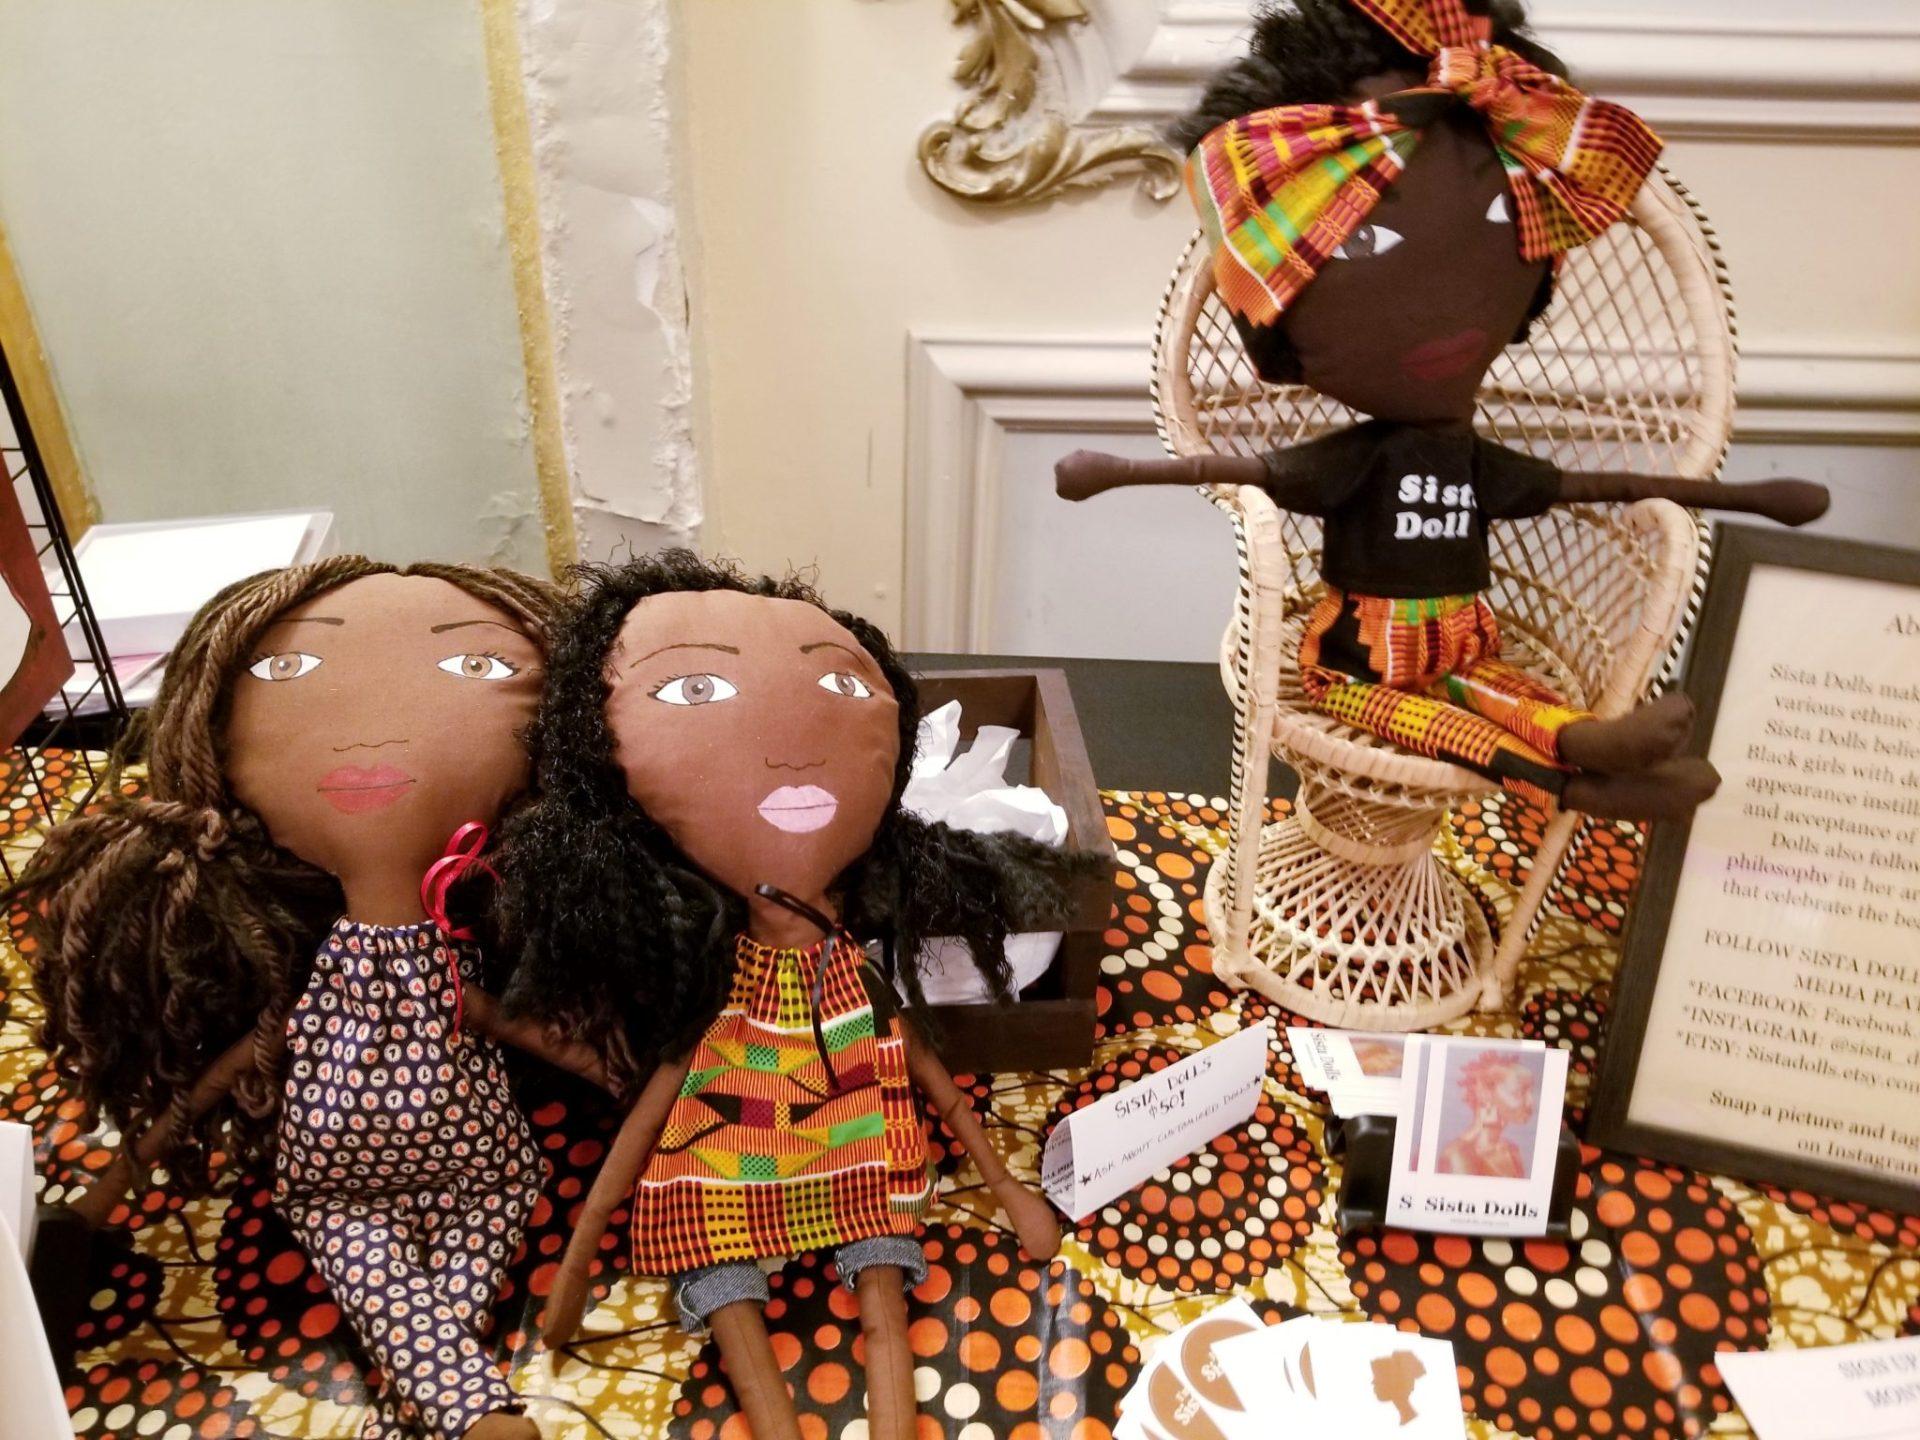 sistah dolls